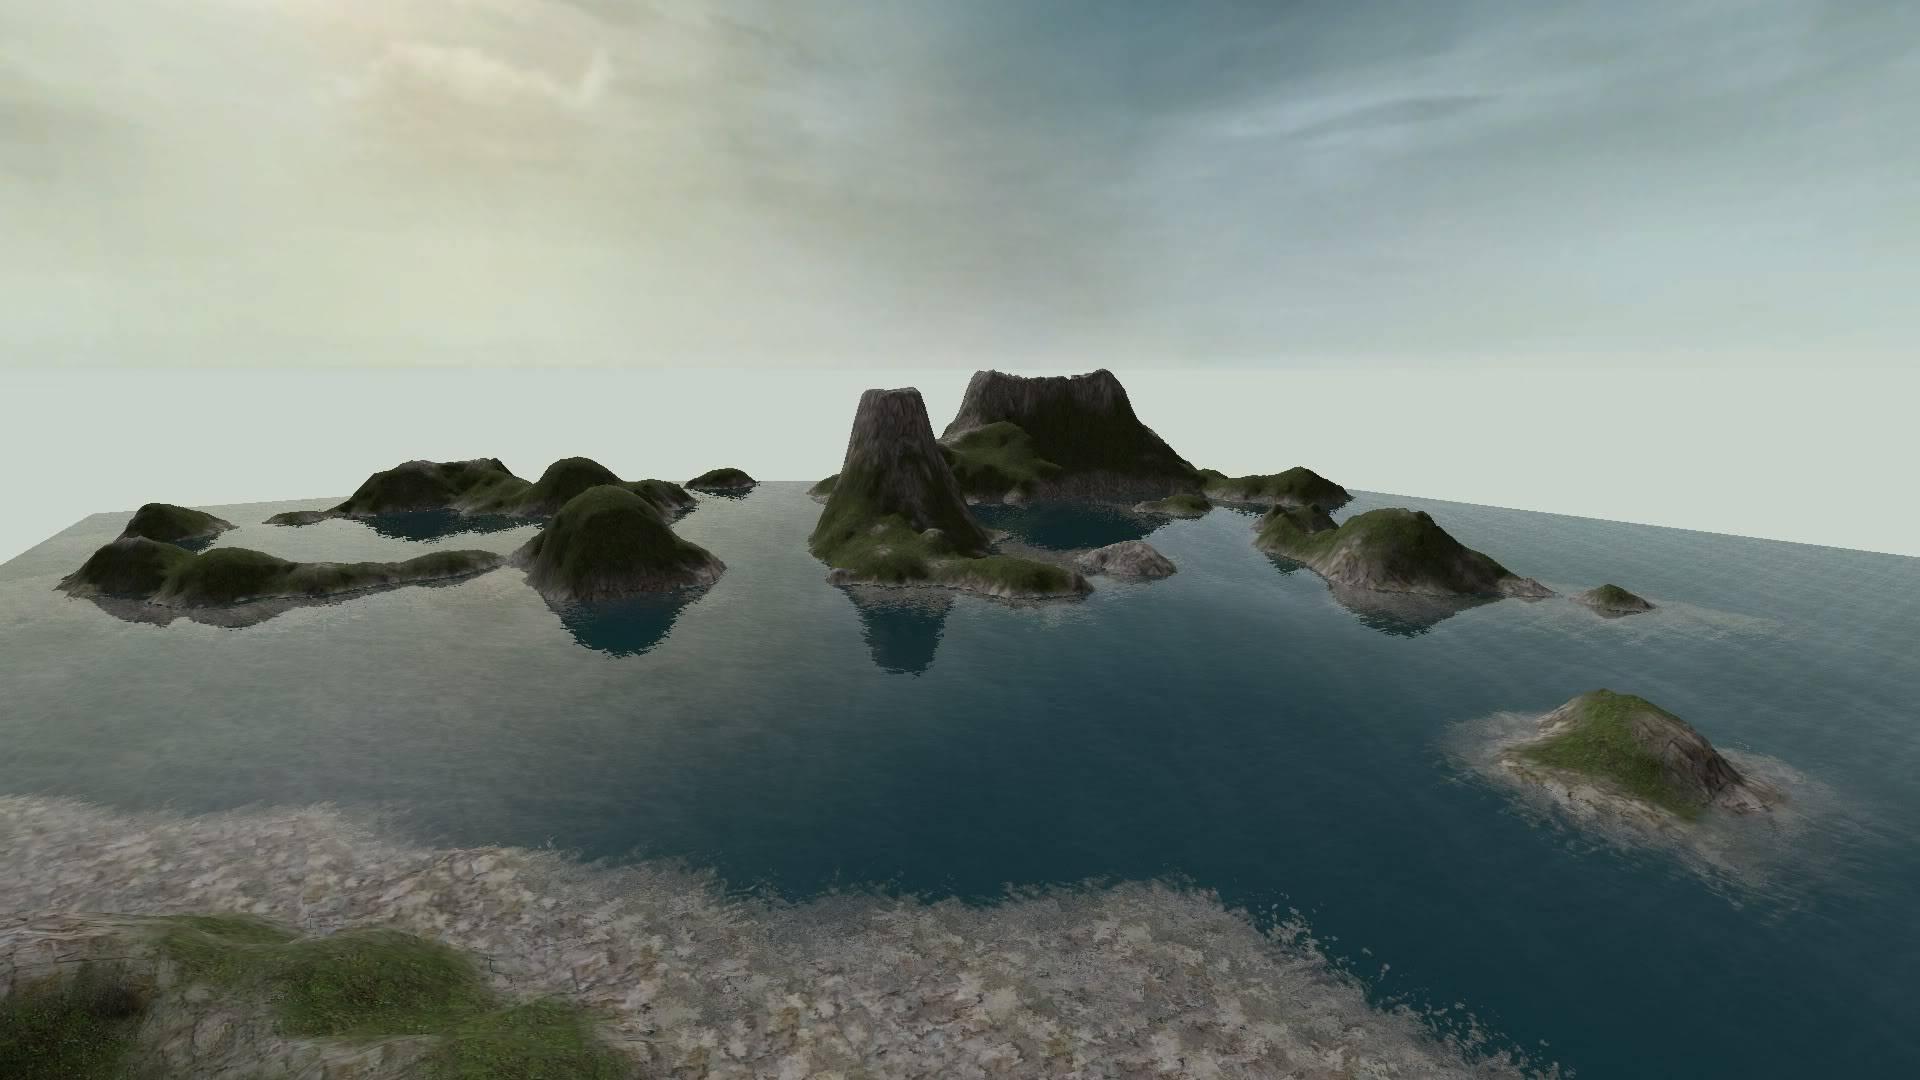 gm_pacific Island2-1